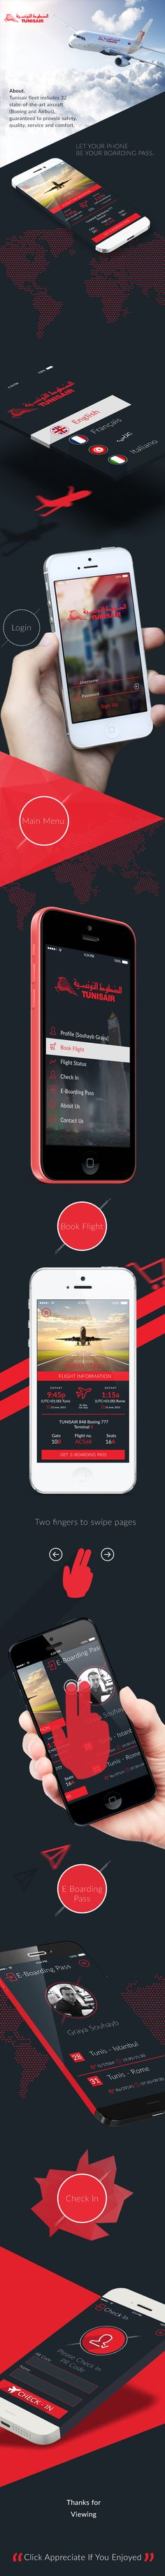 Mobile App Design Inspiration – Tunisair